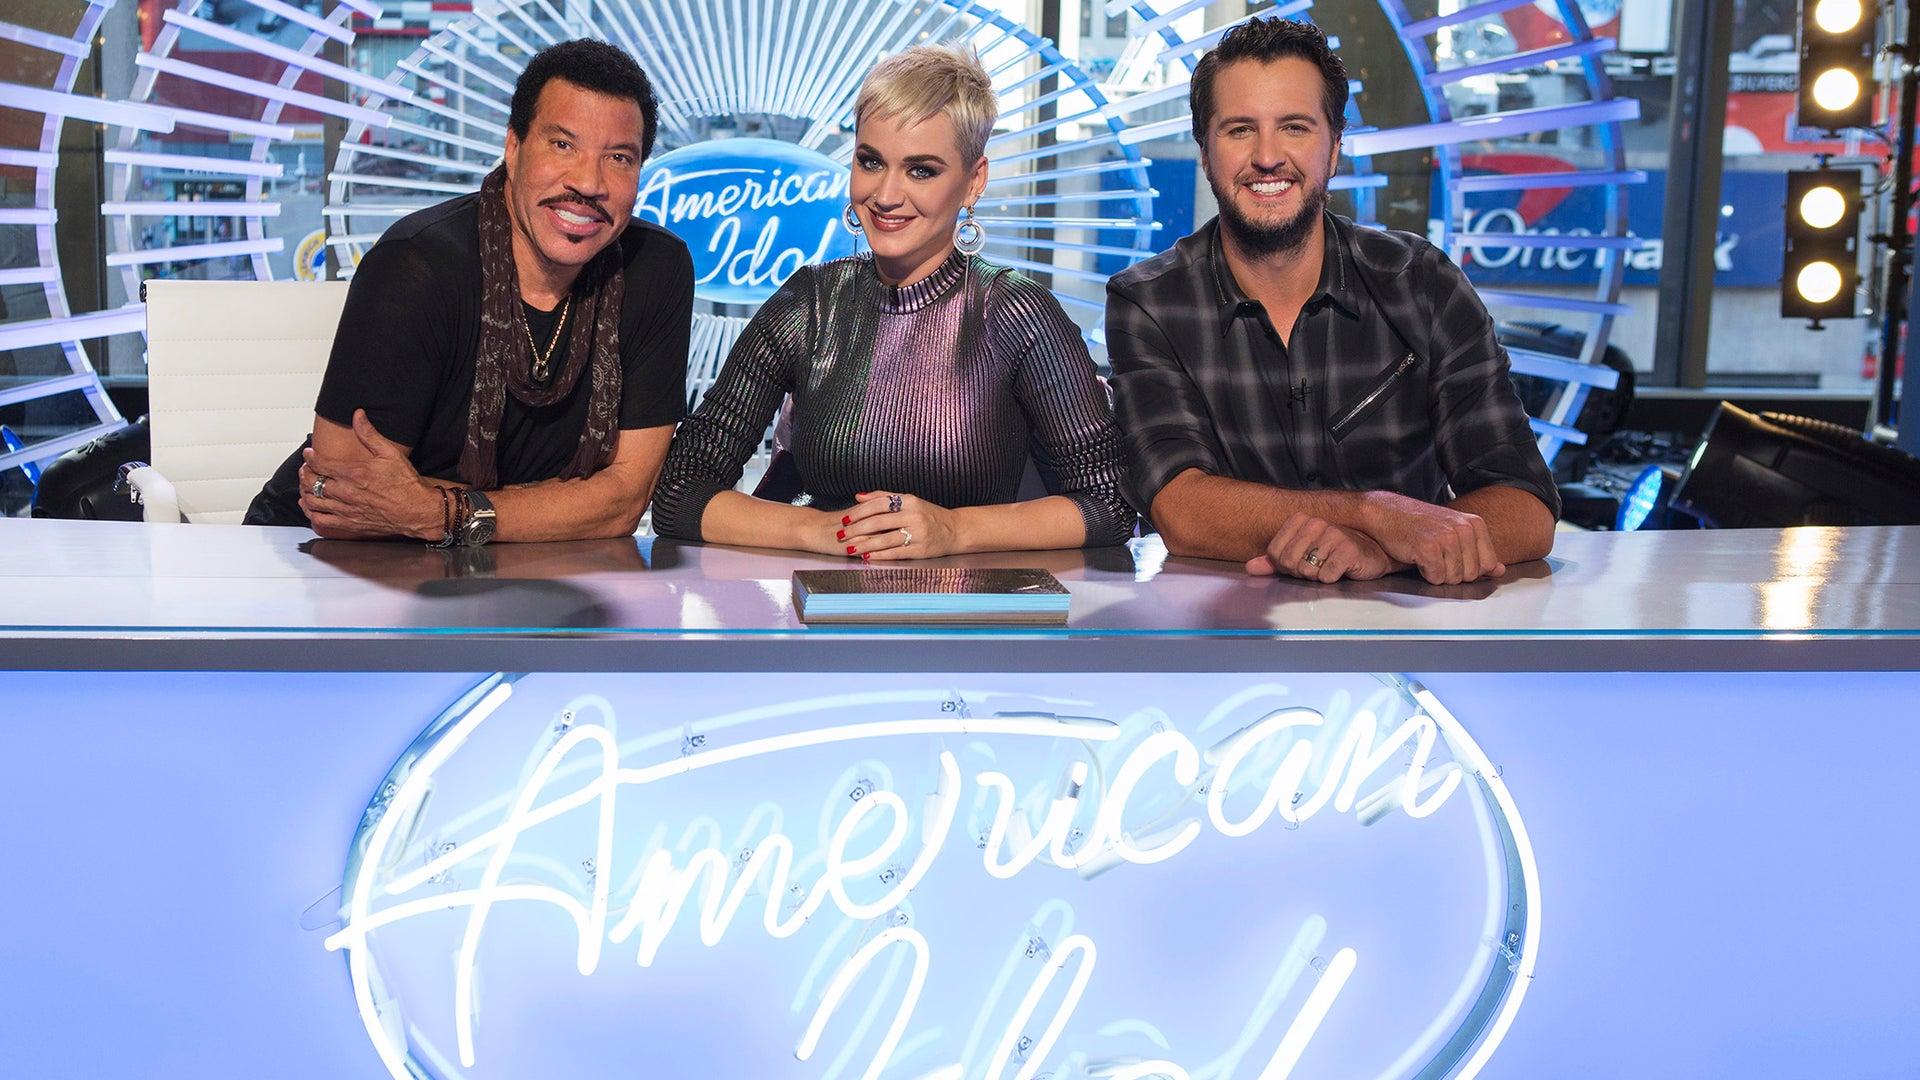 Lionel Richie, Katy Perry and Luke Bryan, American Idol